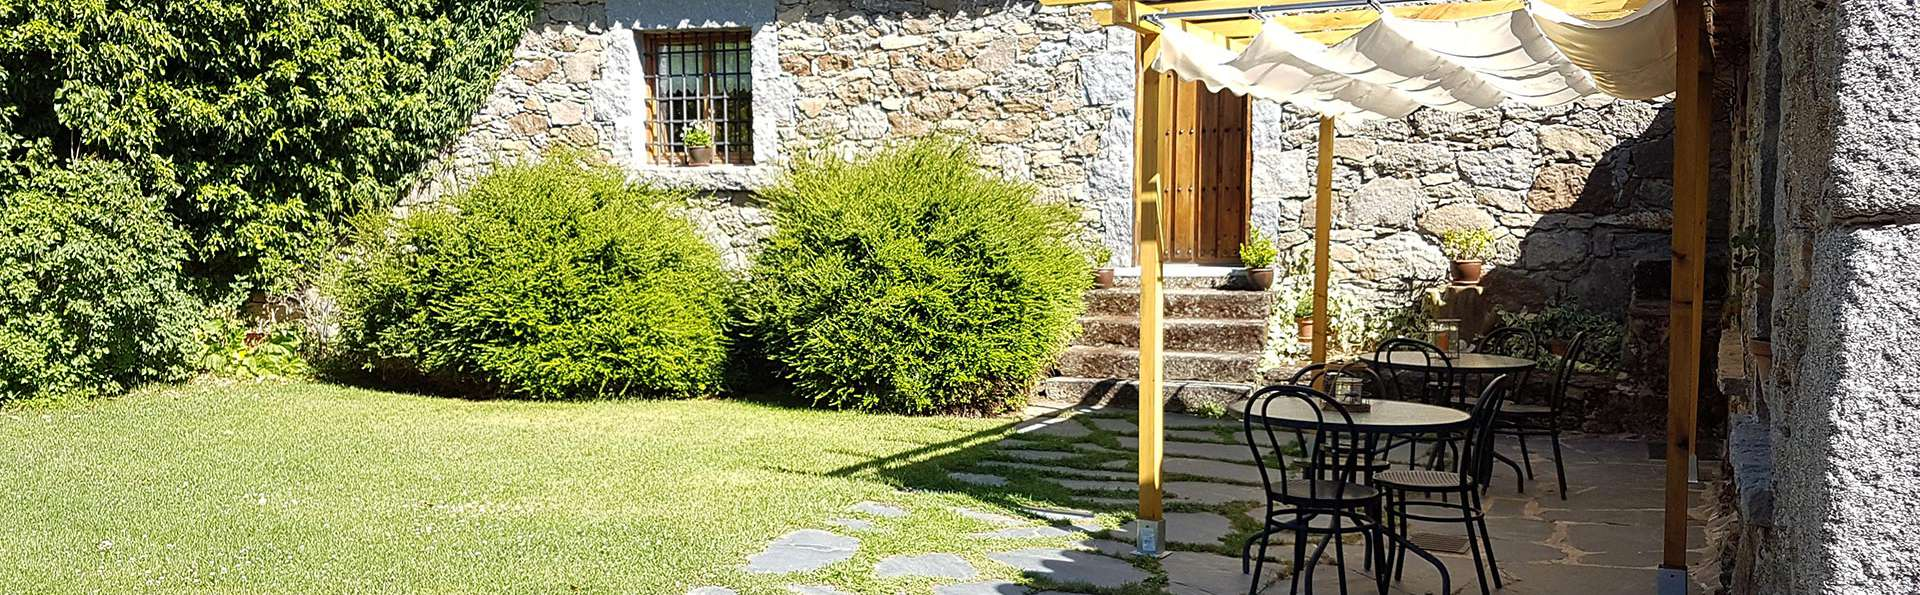 La Trocha De Hoyorredondo - Edit_Garden.jpg